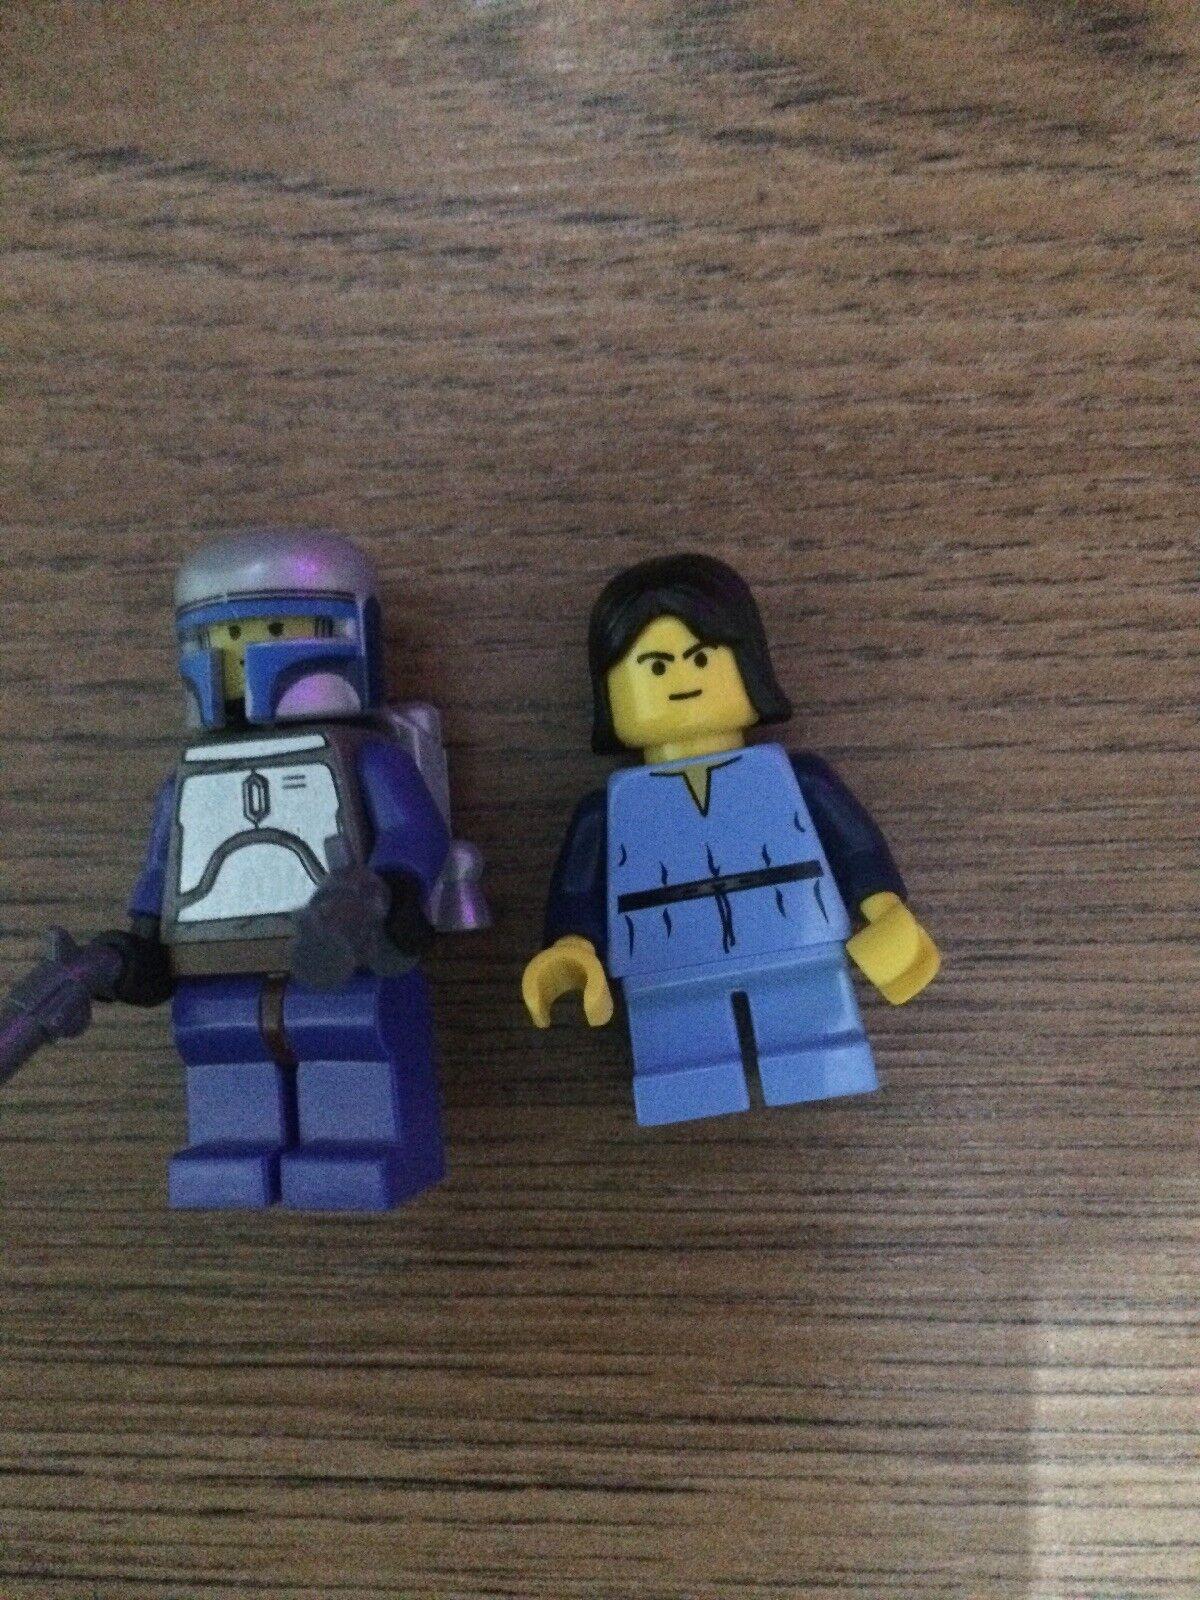 LEGO STAR WARS MINIFIGURES Jango Fett SW053 e i giovani Boba Fett SW054 da 7153